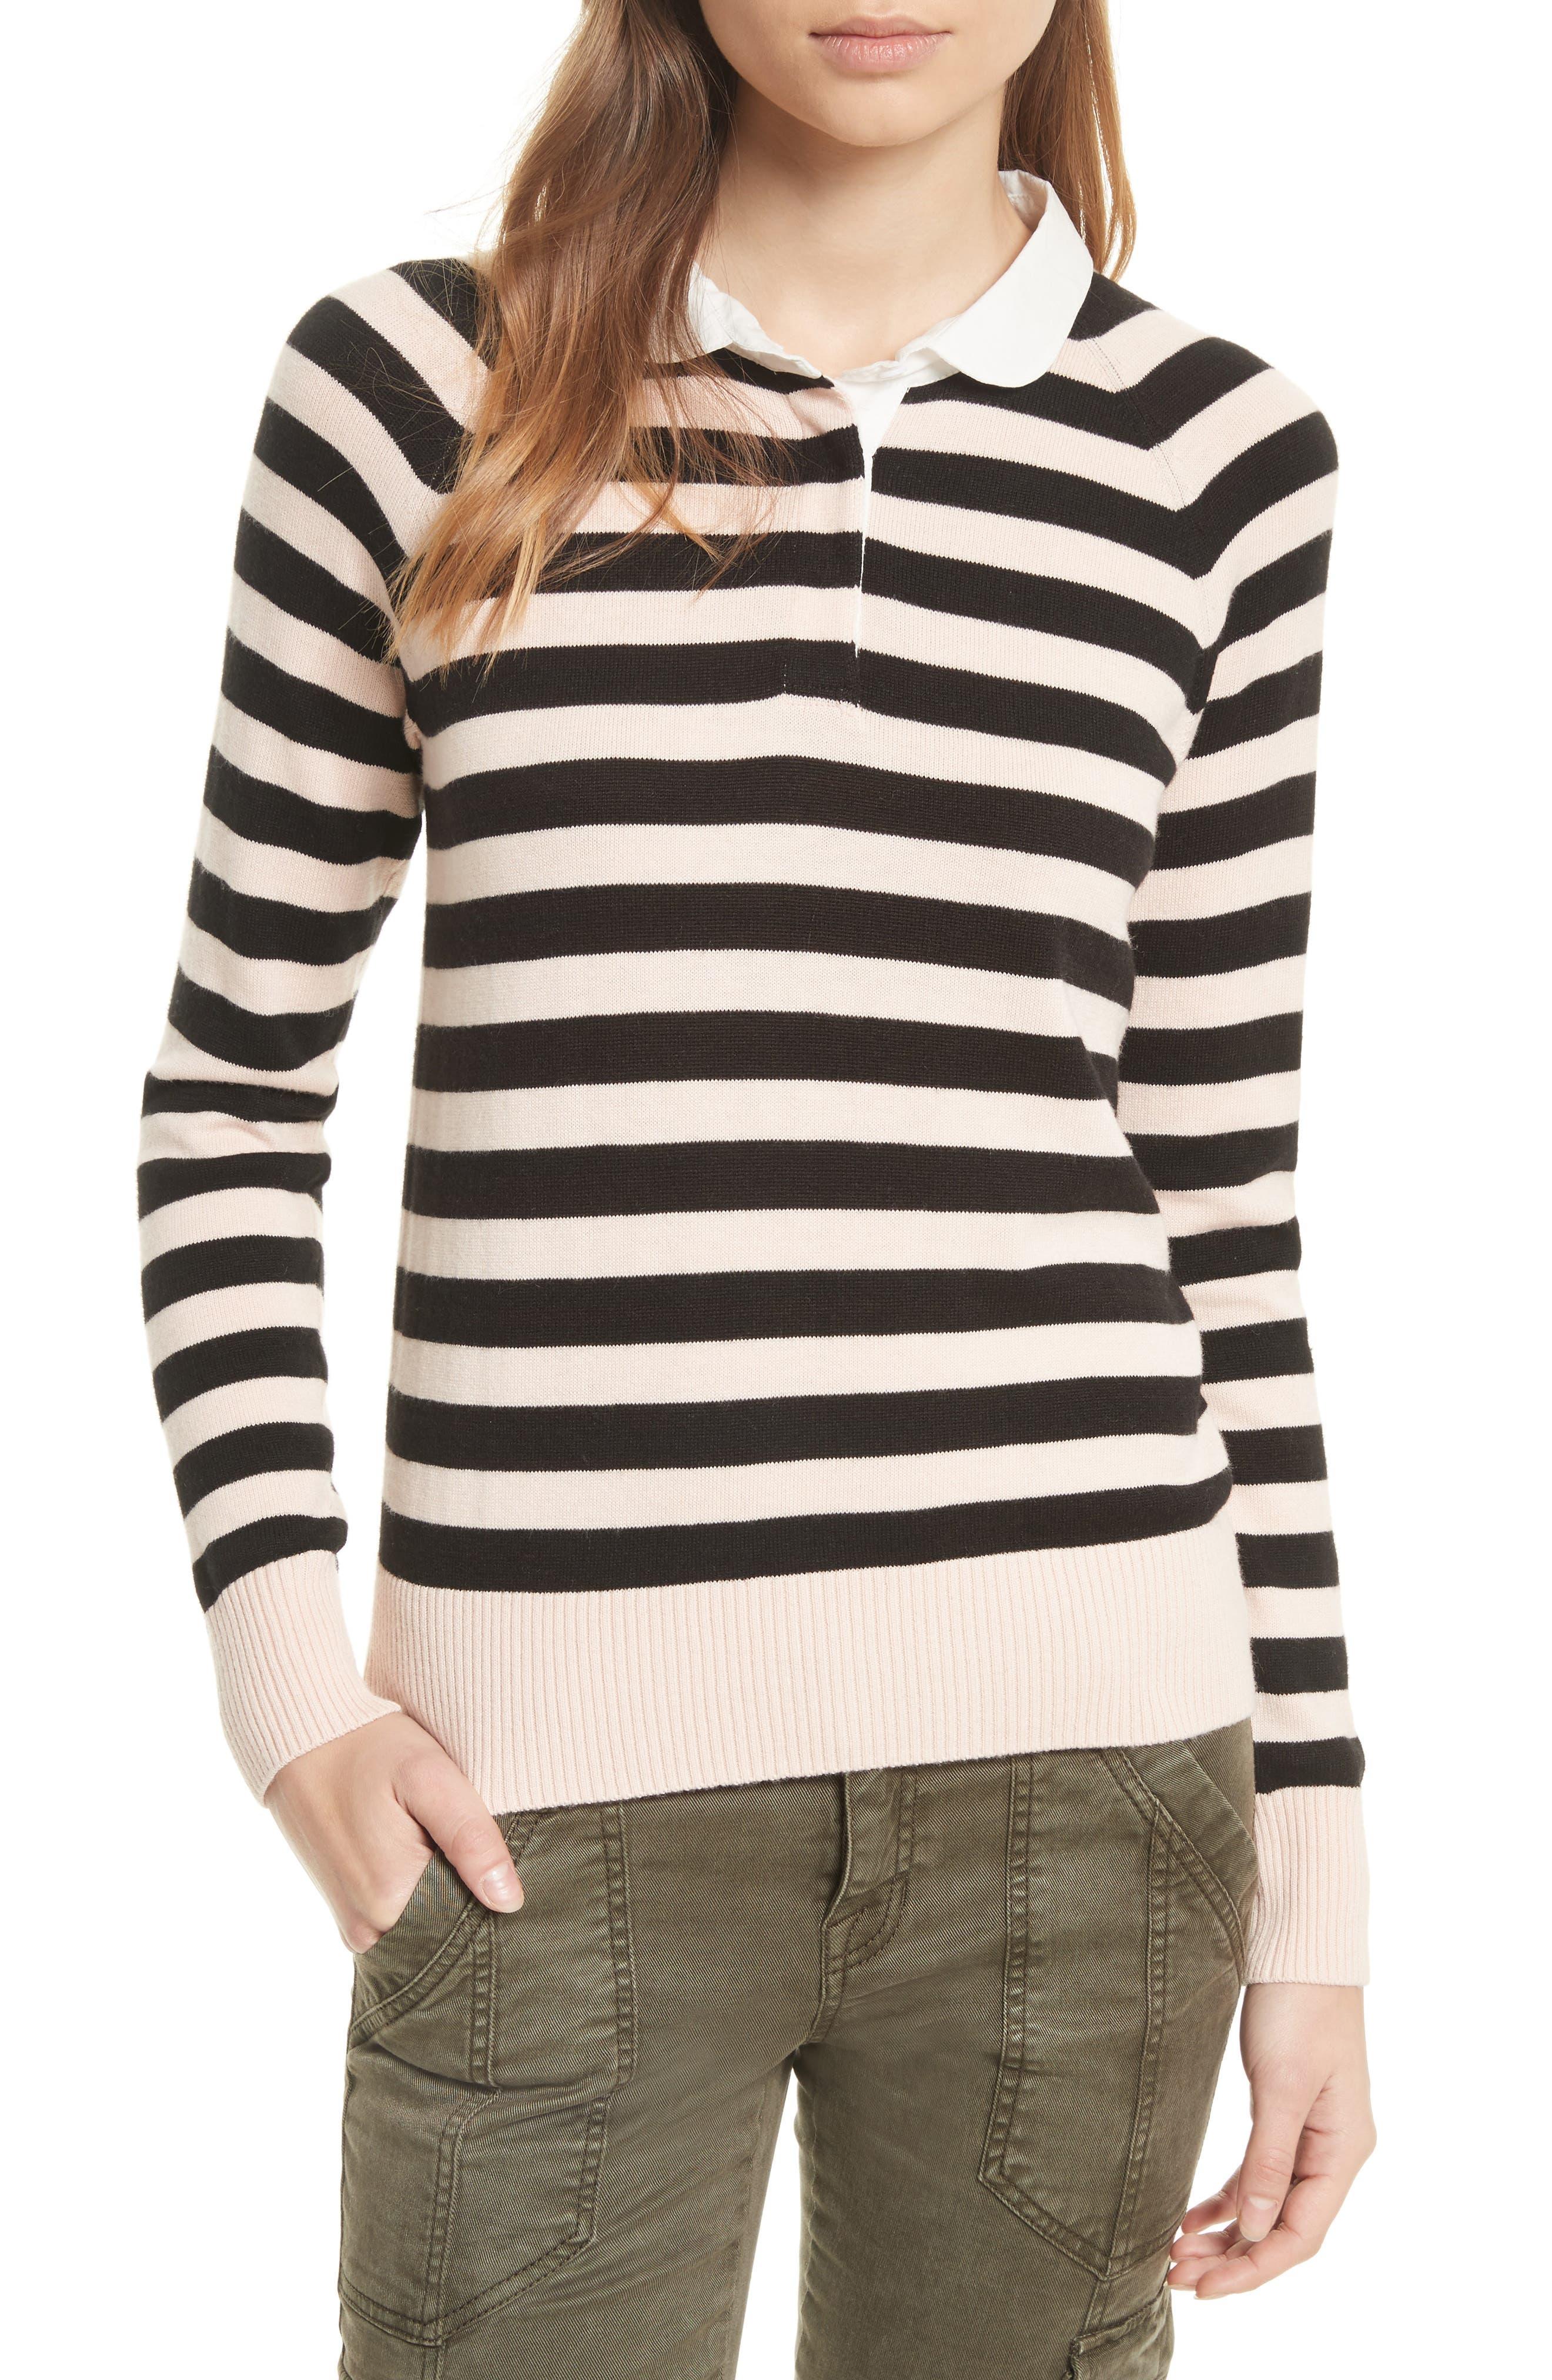 Alternate Image 1 Selected - Joie Gabbe Stripe Sweater